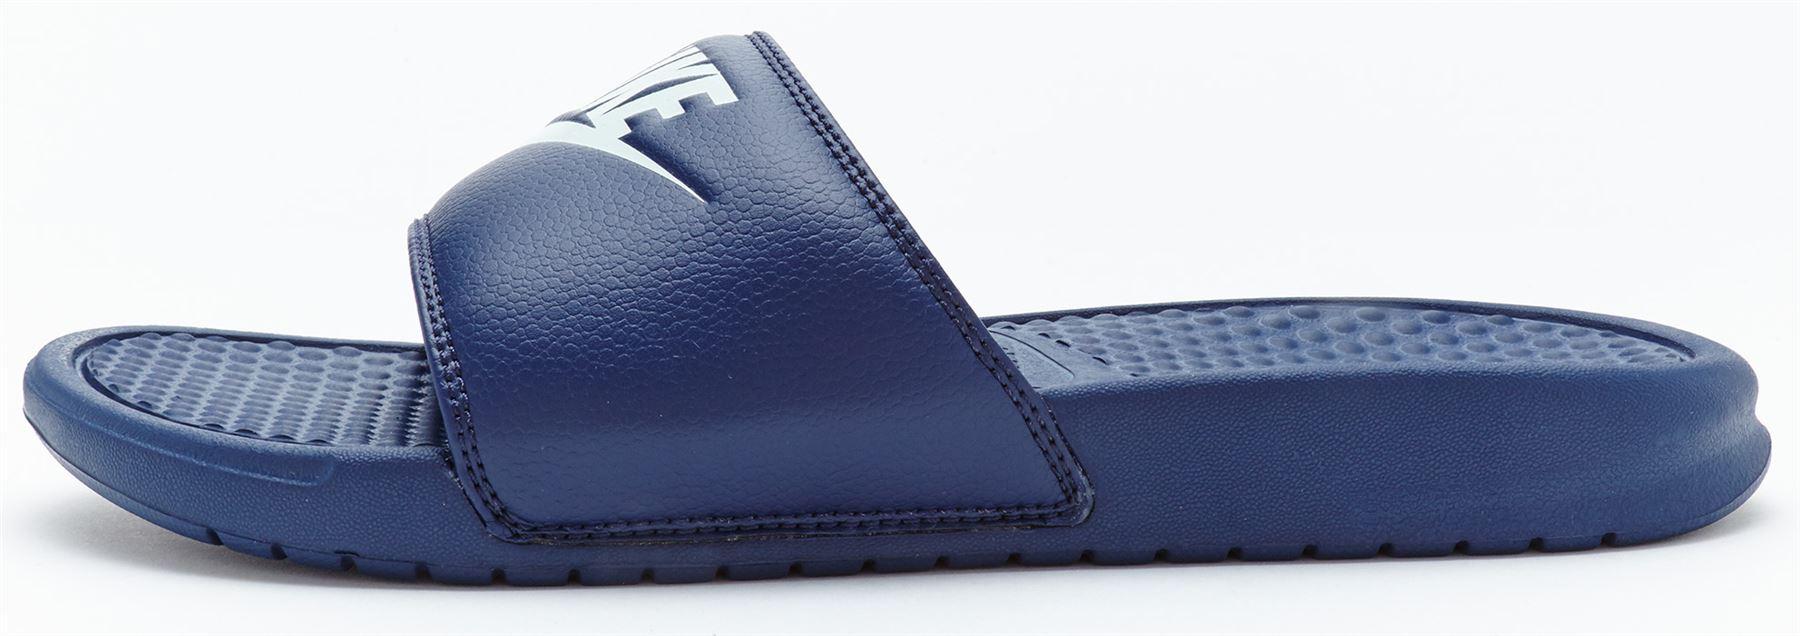 Slide En Do Sandales Nike Just Marine Bleu Midnight Benassi It Tongs f0ExwIq